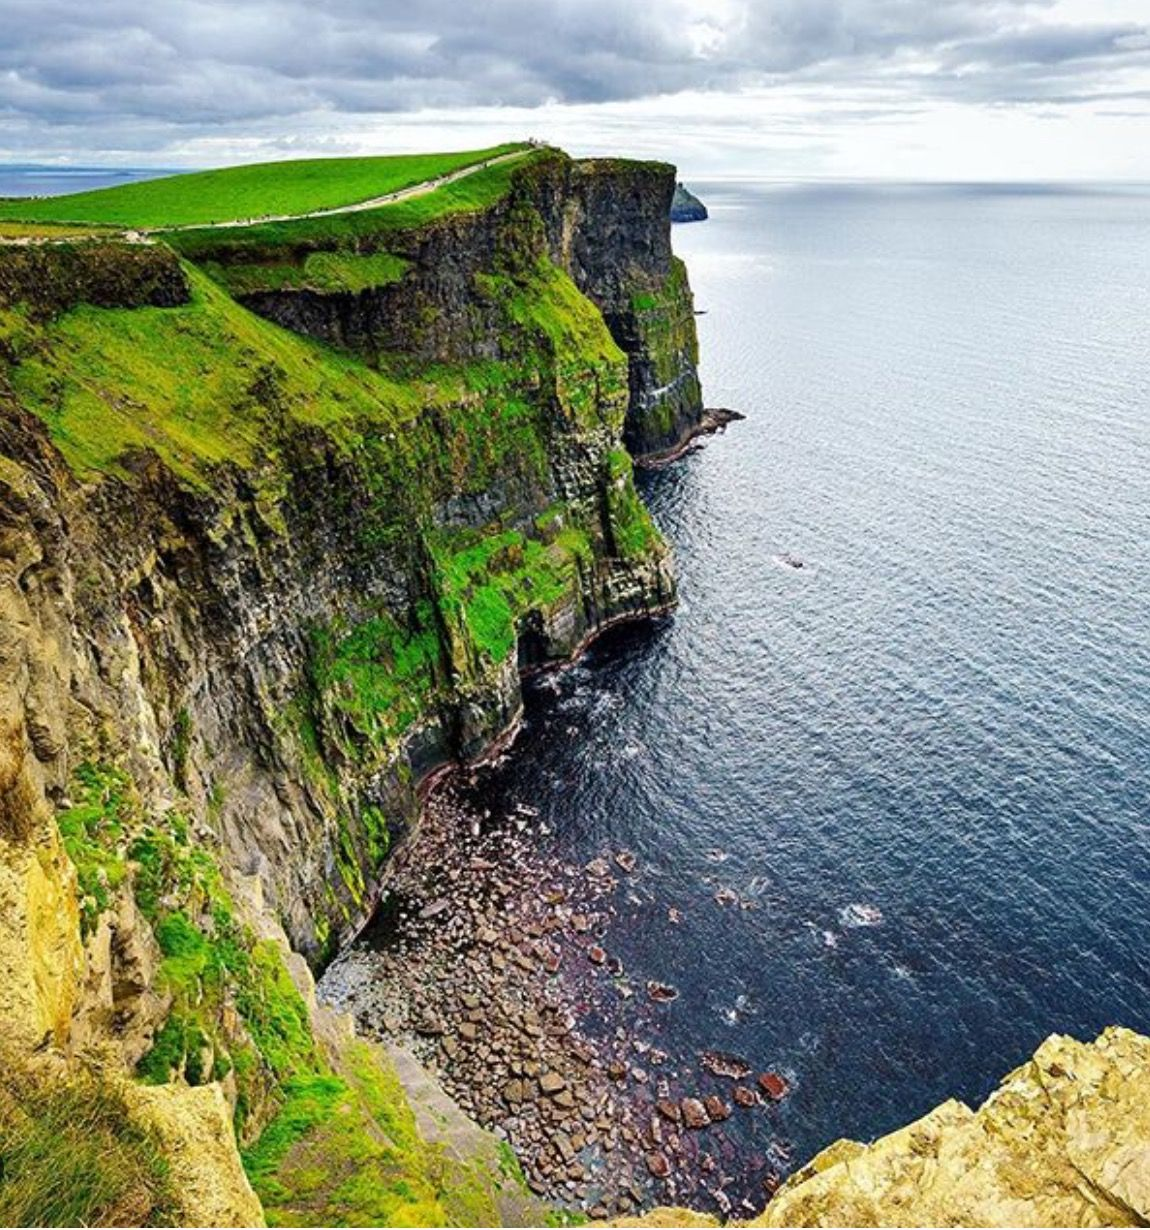 Travel Scenery: Cliffs Of Moher, Ireland